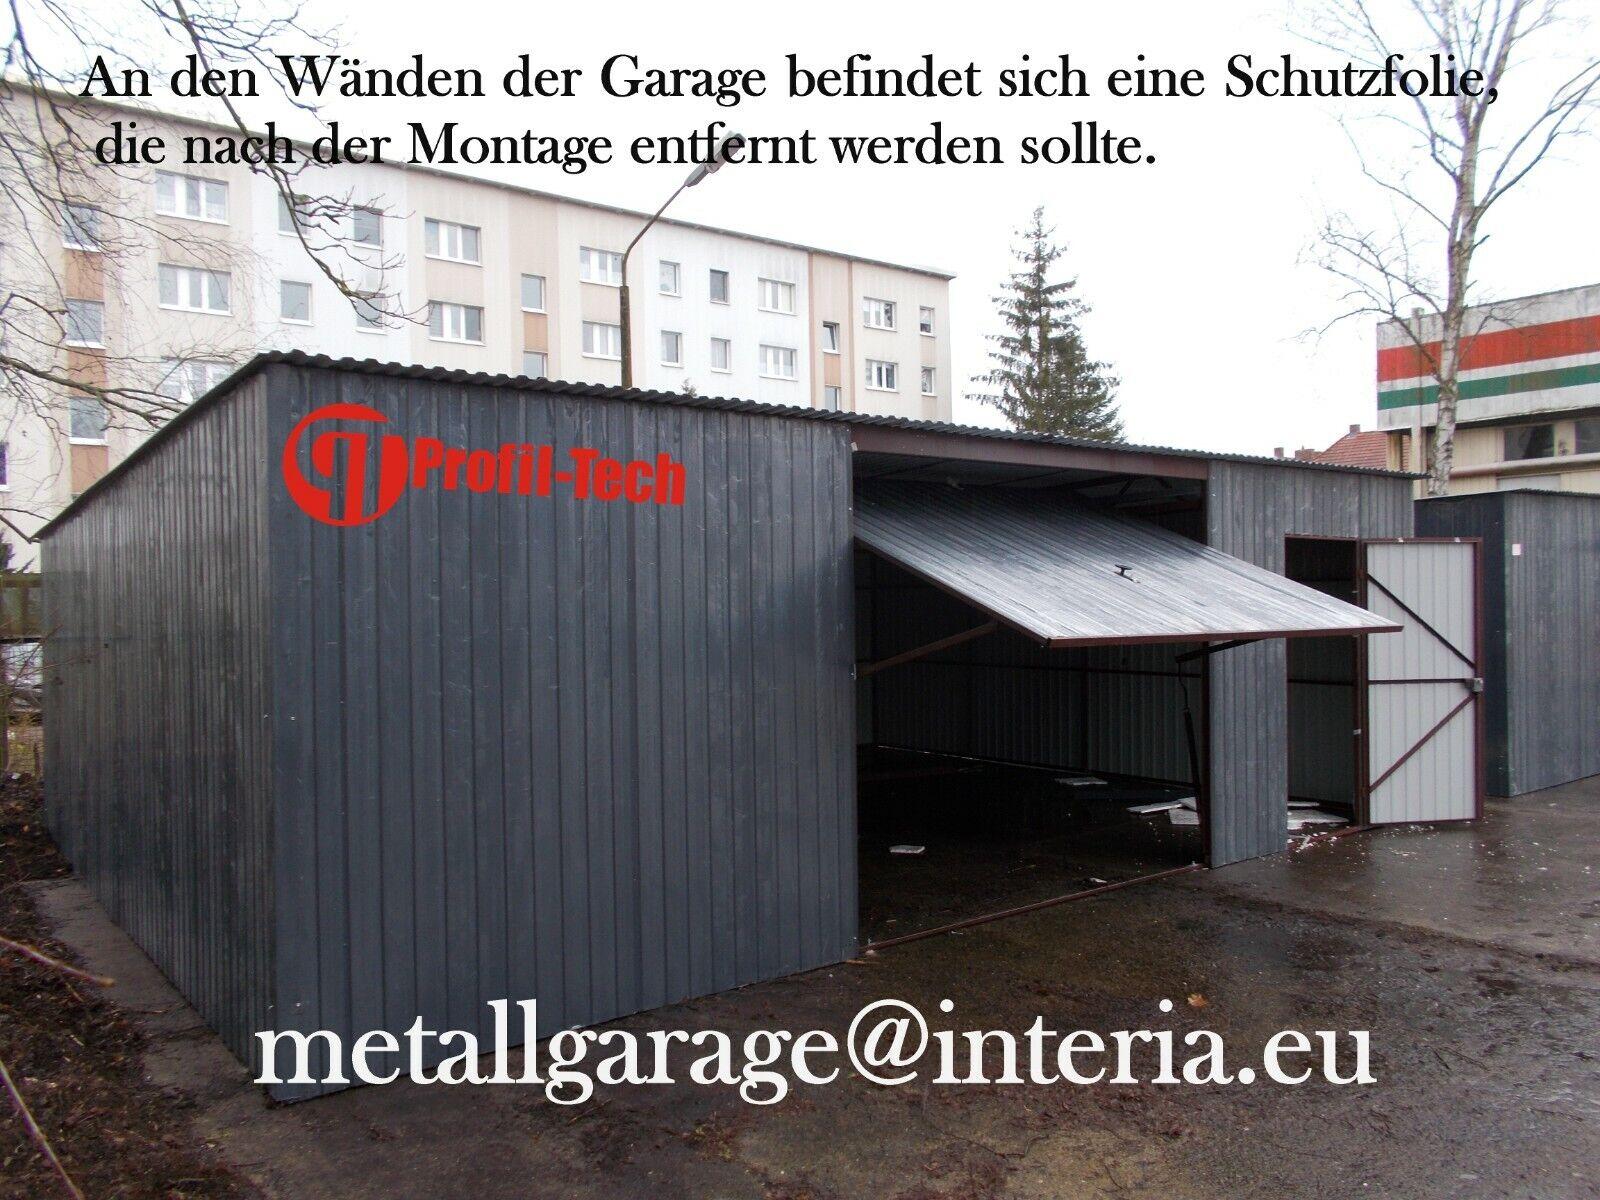 9x4 Blechgarage Fertiggarage Metallgarage RAUM KFZ REIFEN LAGER GARAGE